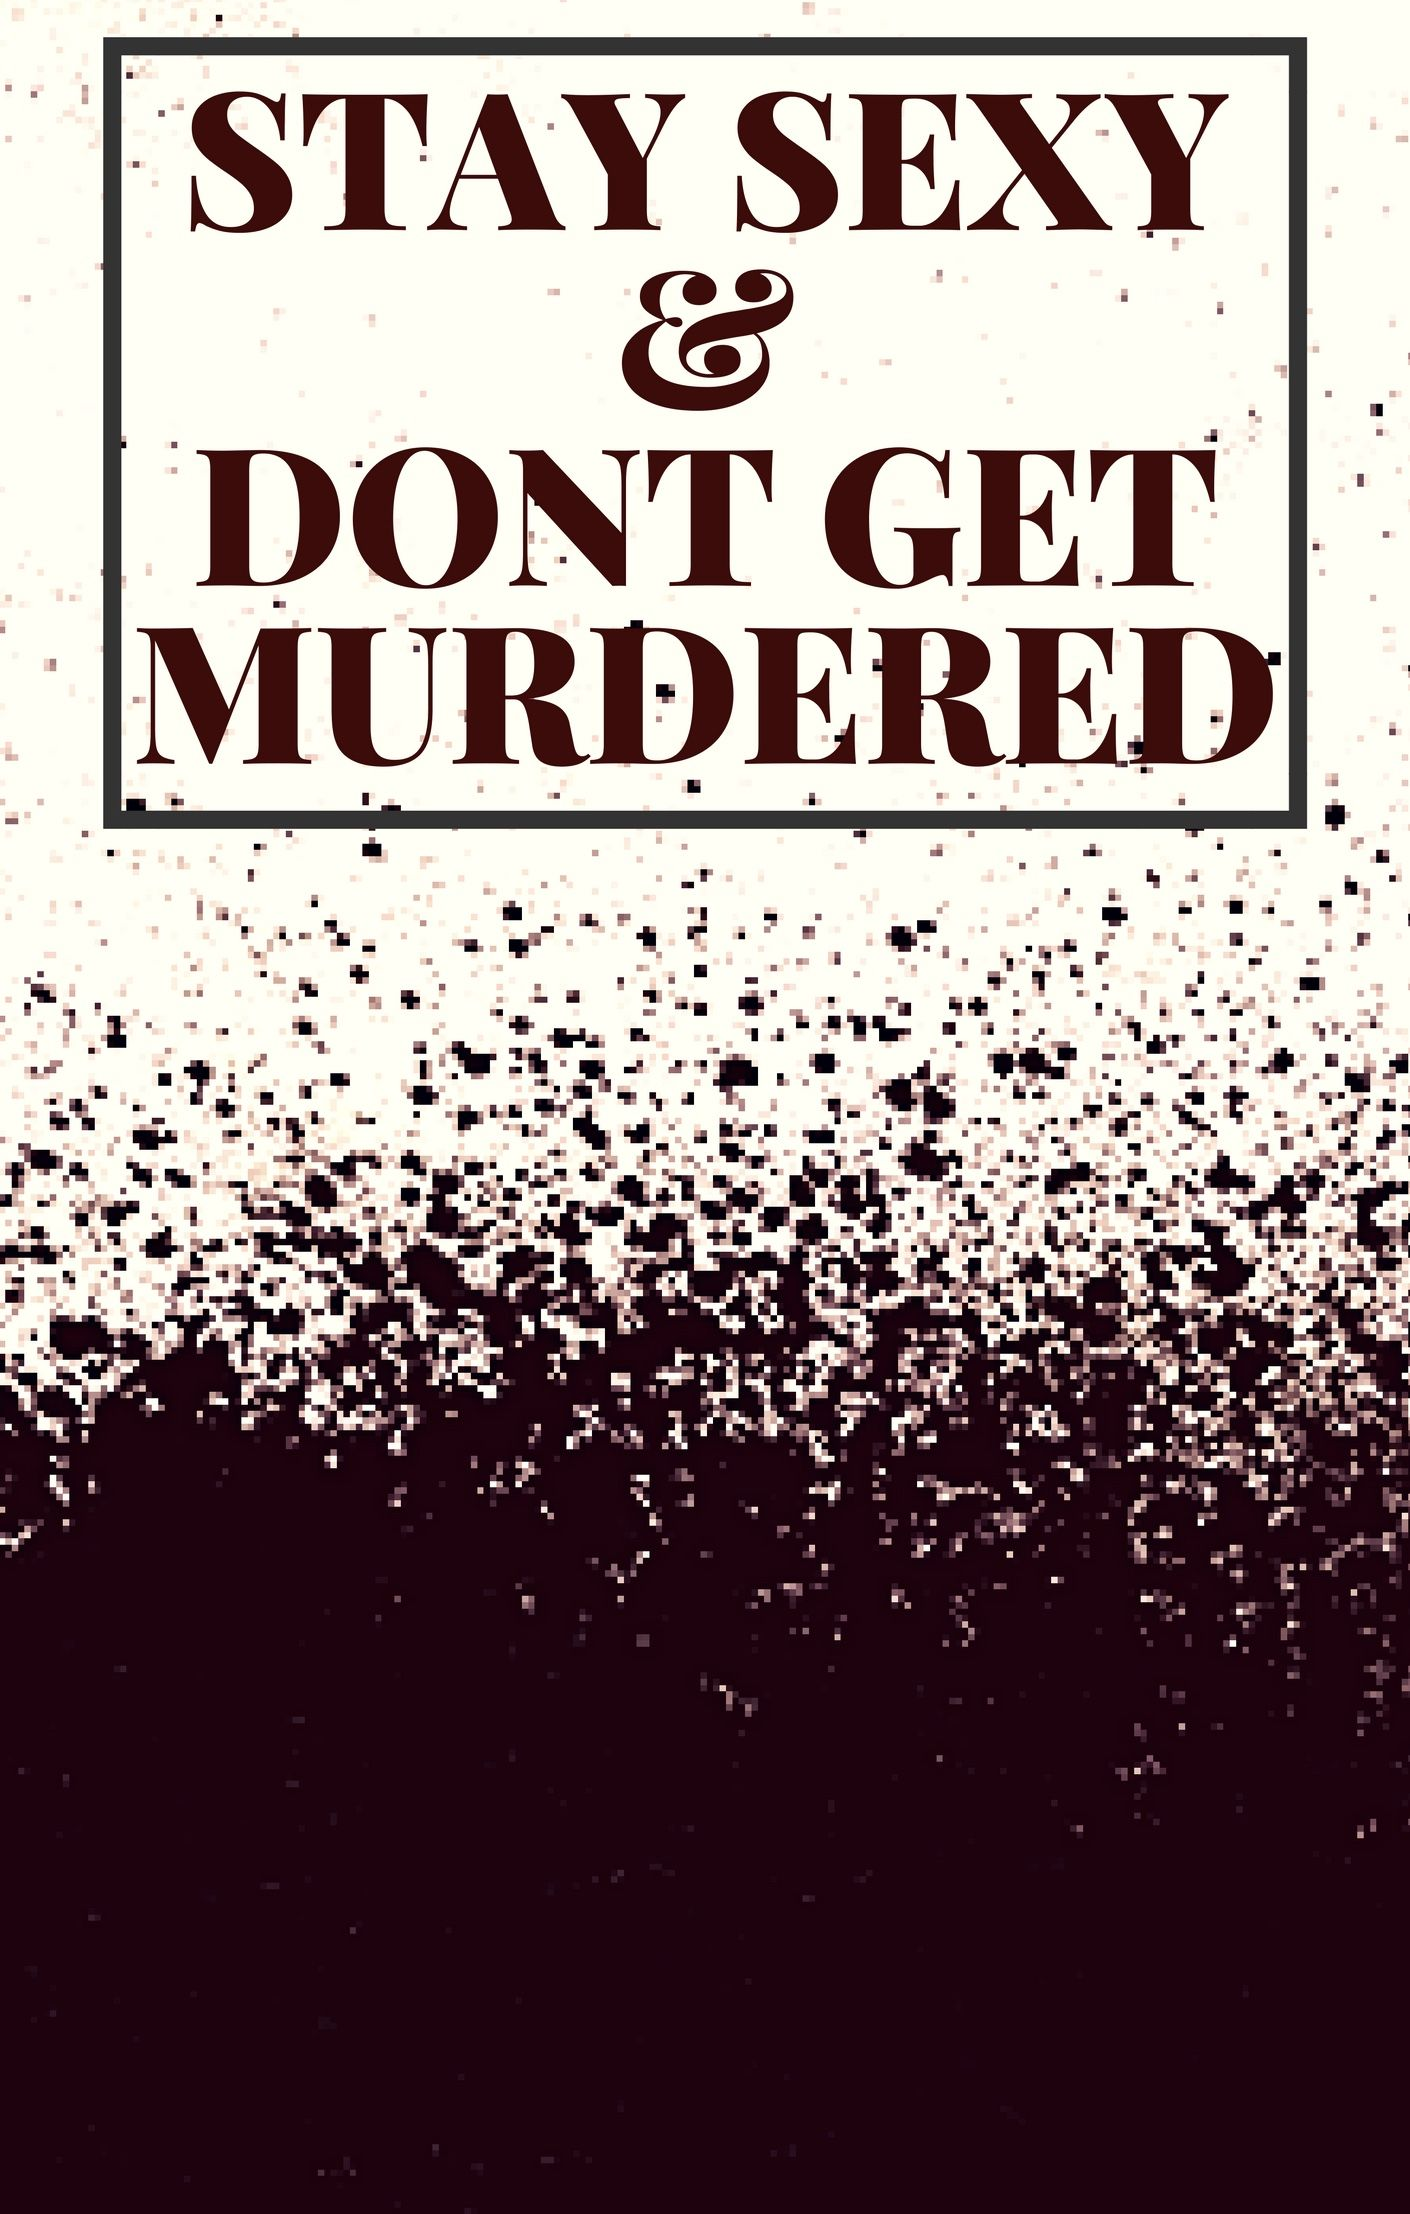 MFM #SSDGM #MyFavoriteMurder #TrueCrime #Murder #Murderino